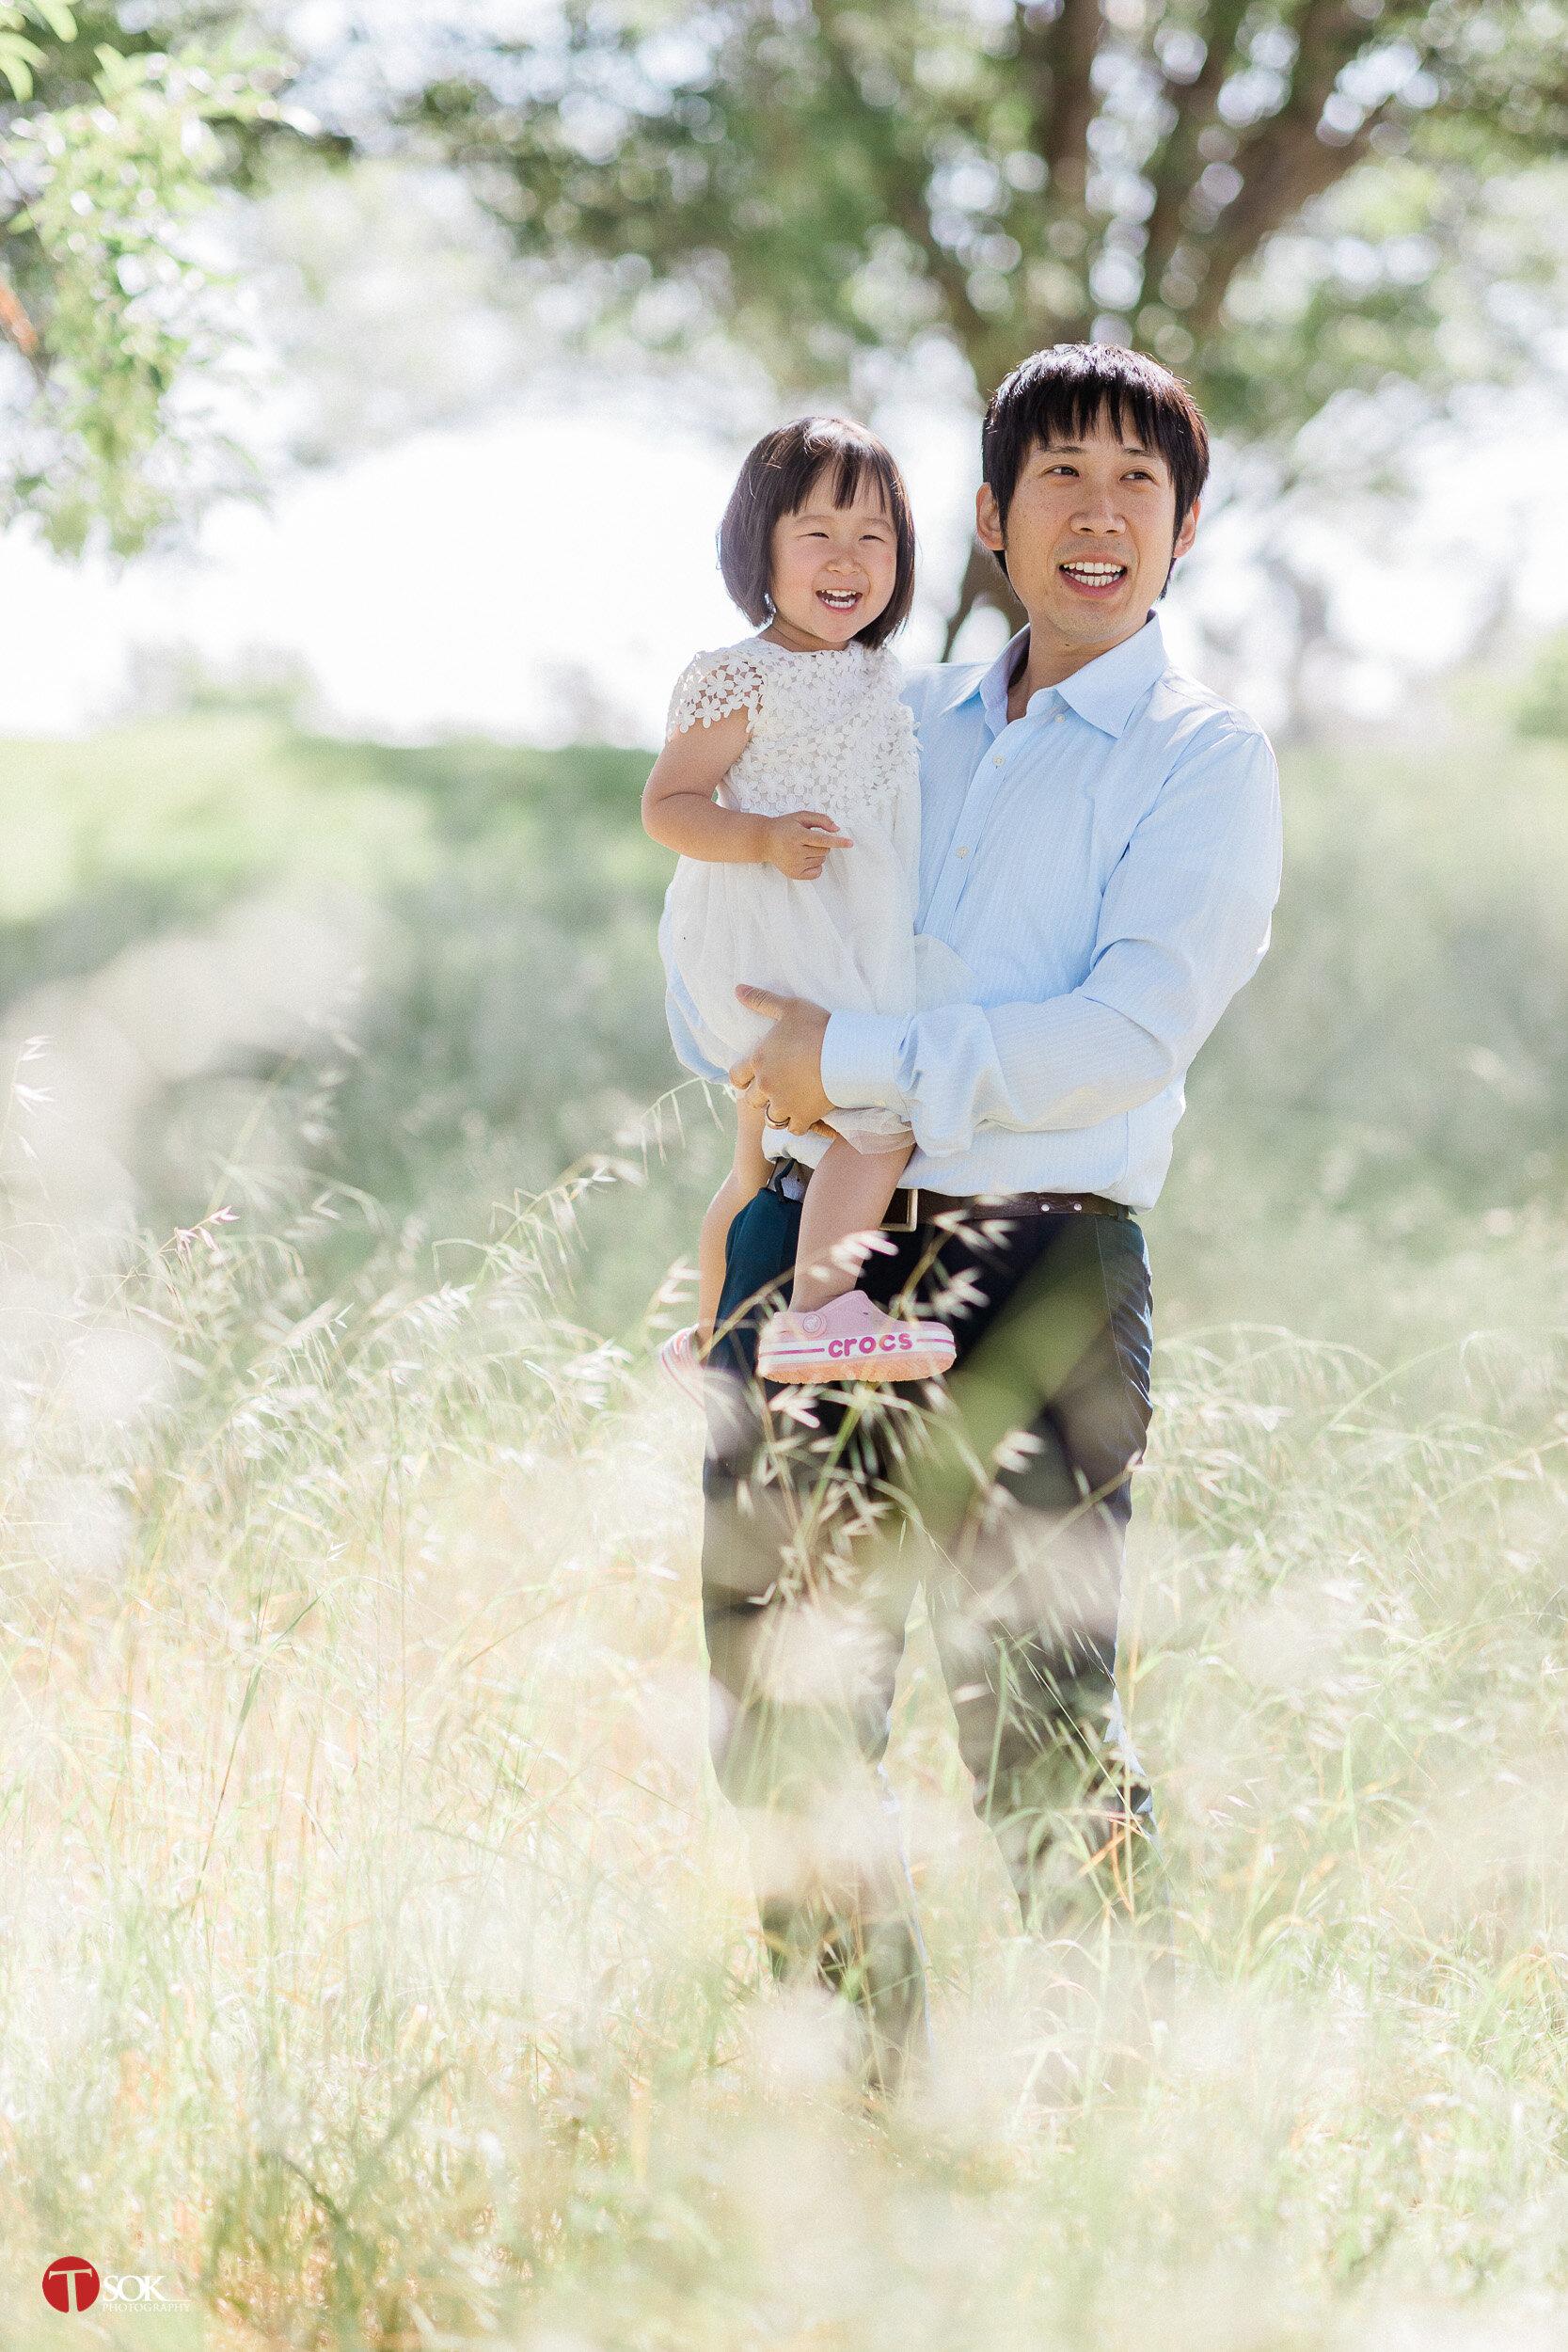 20190504_0002_yuen_maternity_baylands_park.jpg